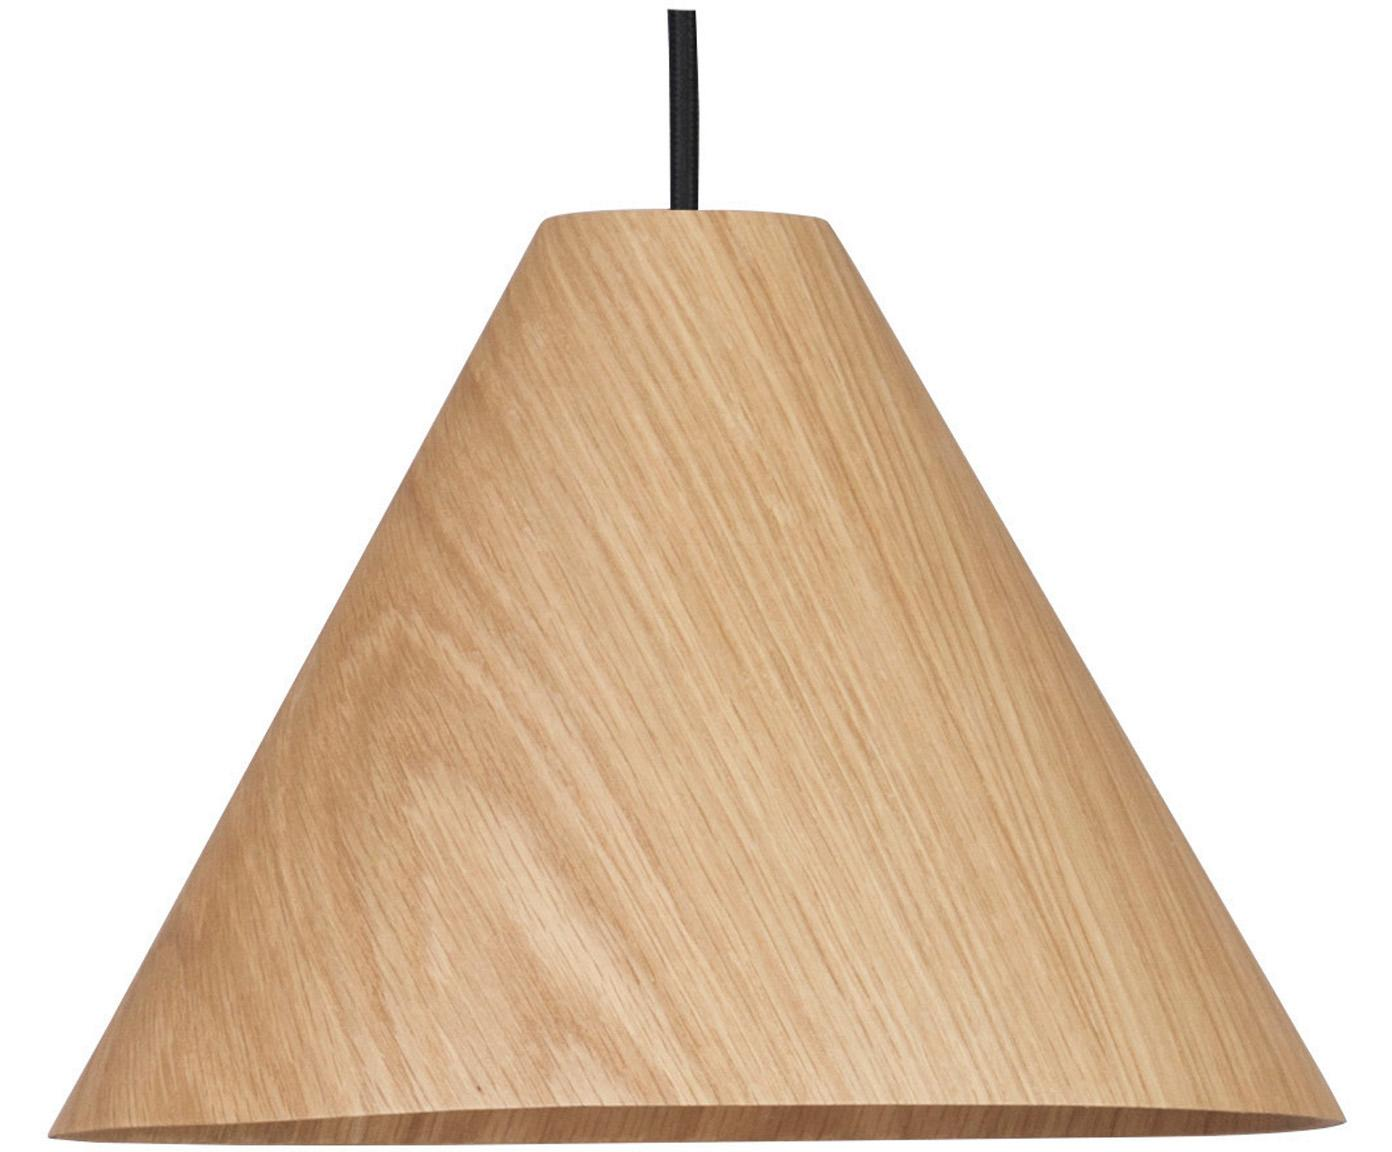 Hanglamp Wera van hout, Lampenkap: hout, Baldakijn: hout, Houtkleurig, zwart, Ø 25 x H 130 cm